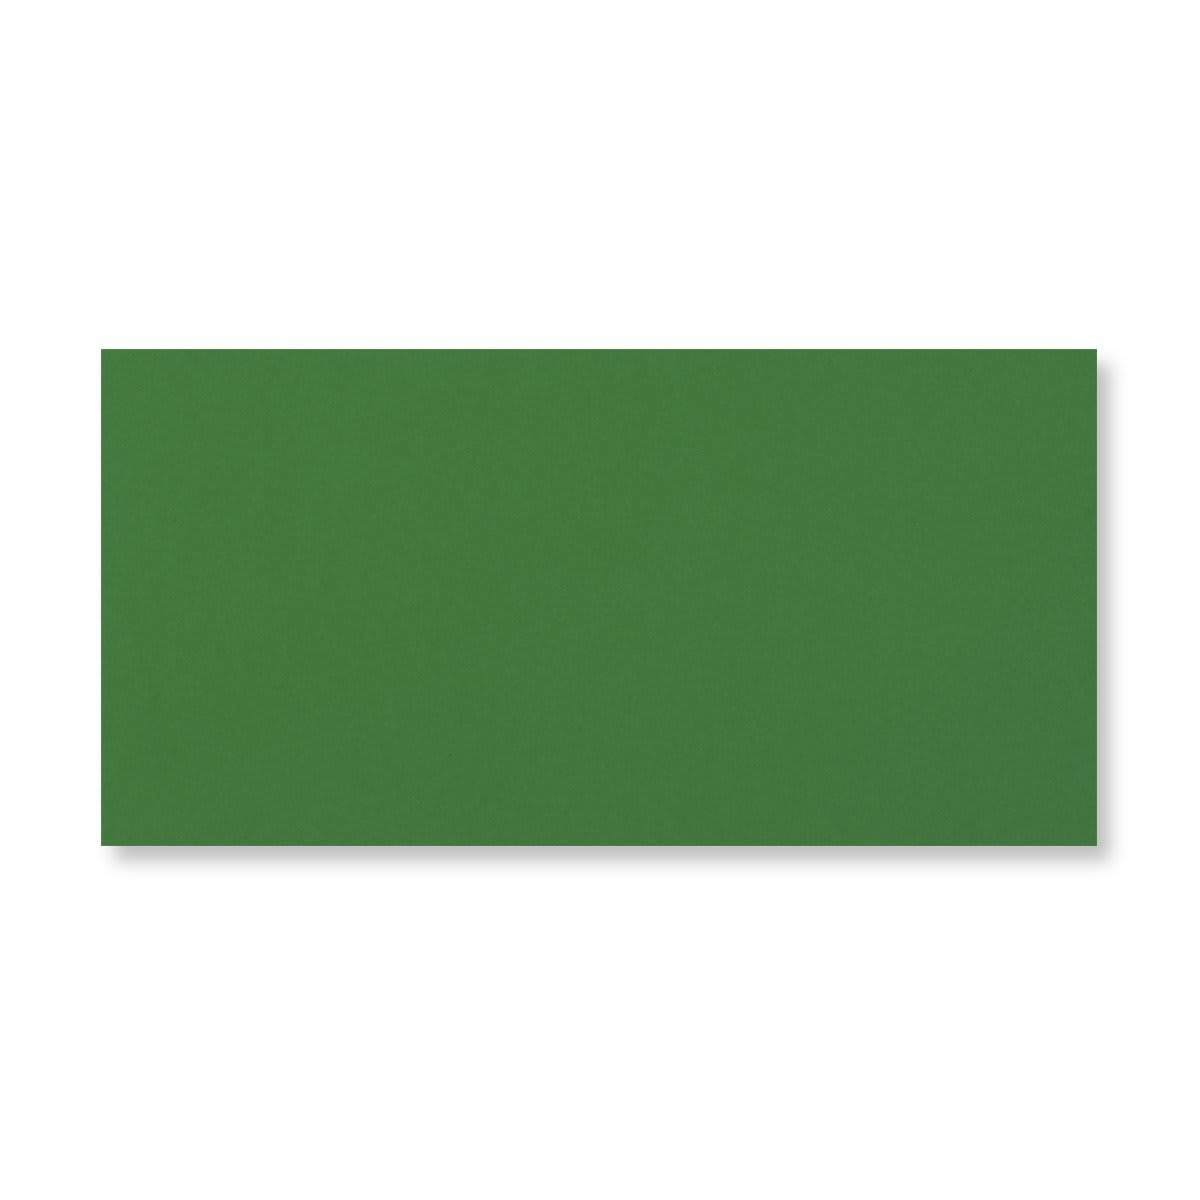 DL DEEP GREEN PEEL AND SEAL ENVELOPES